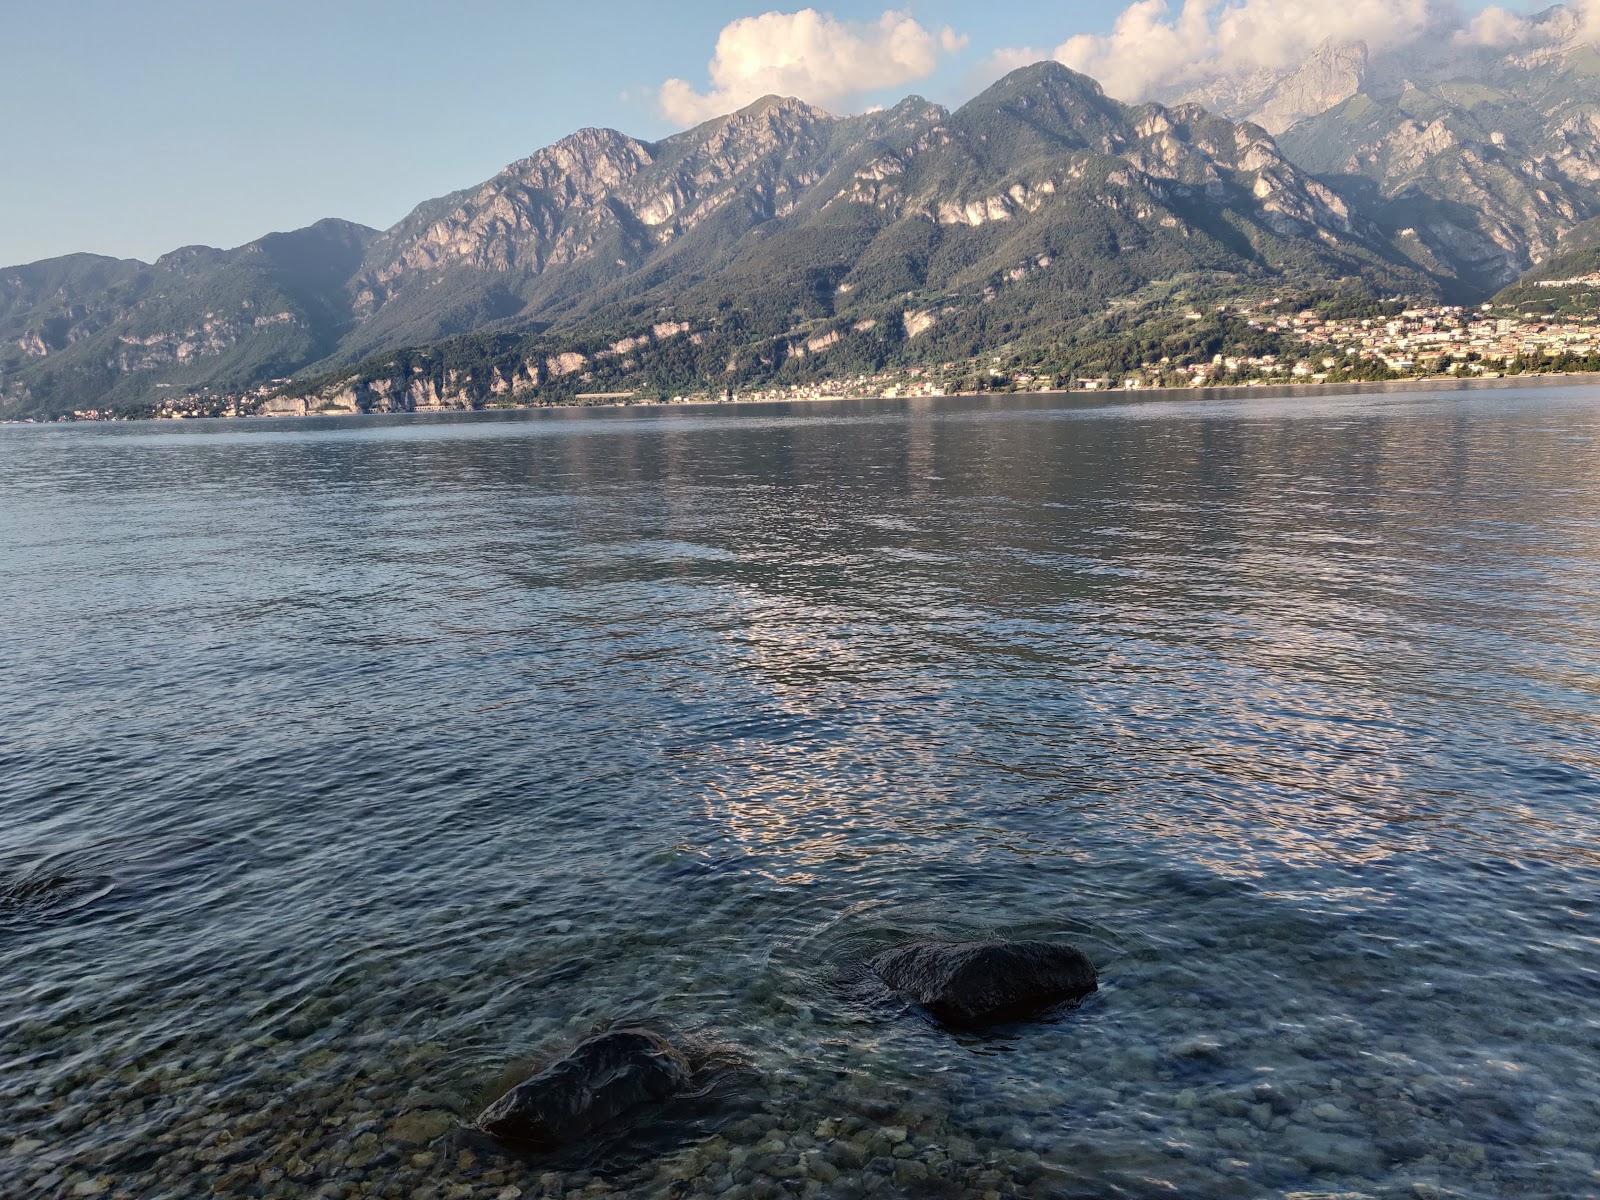 Lake Bellagio View